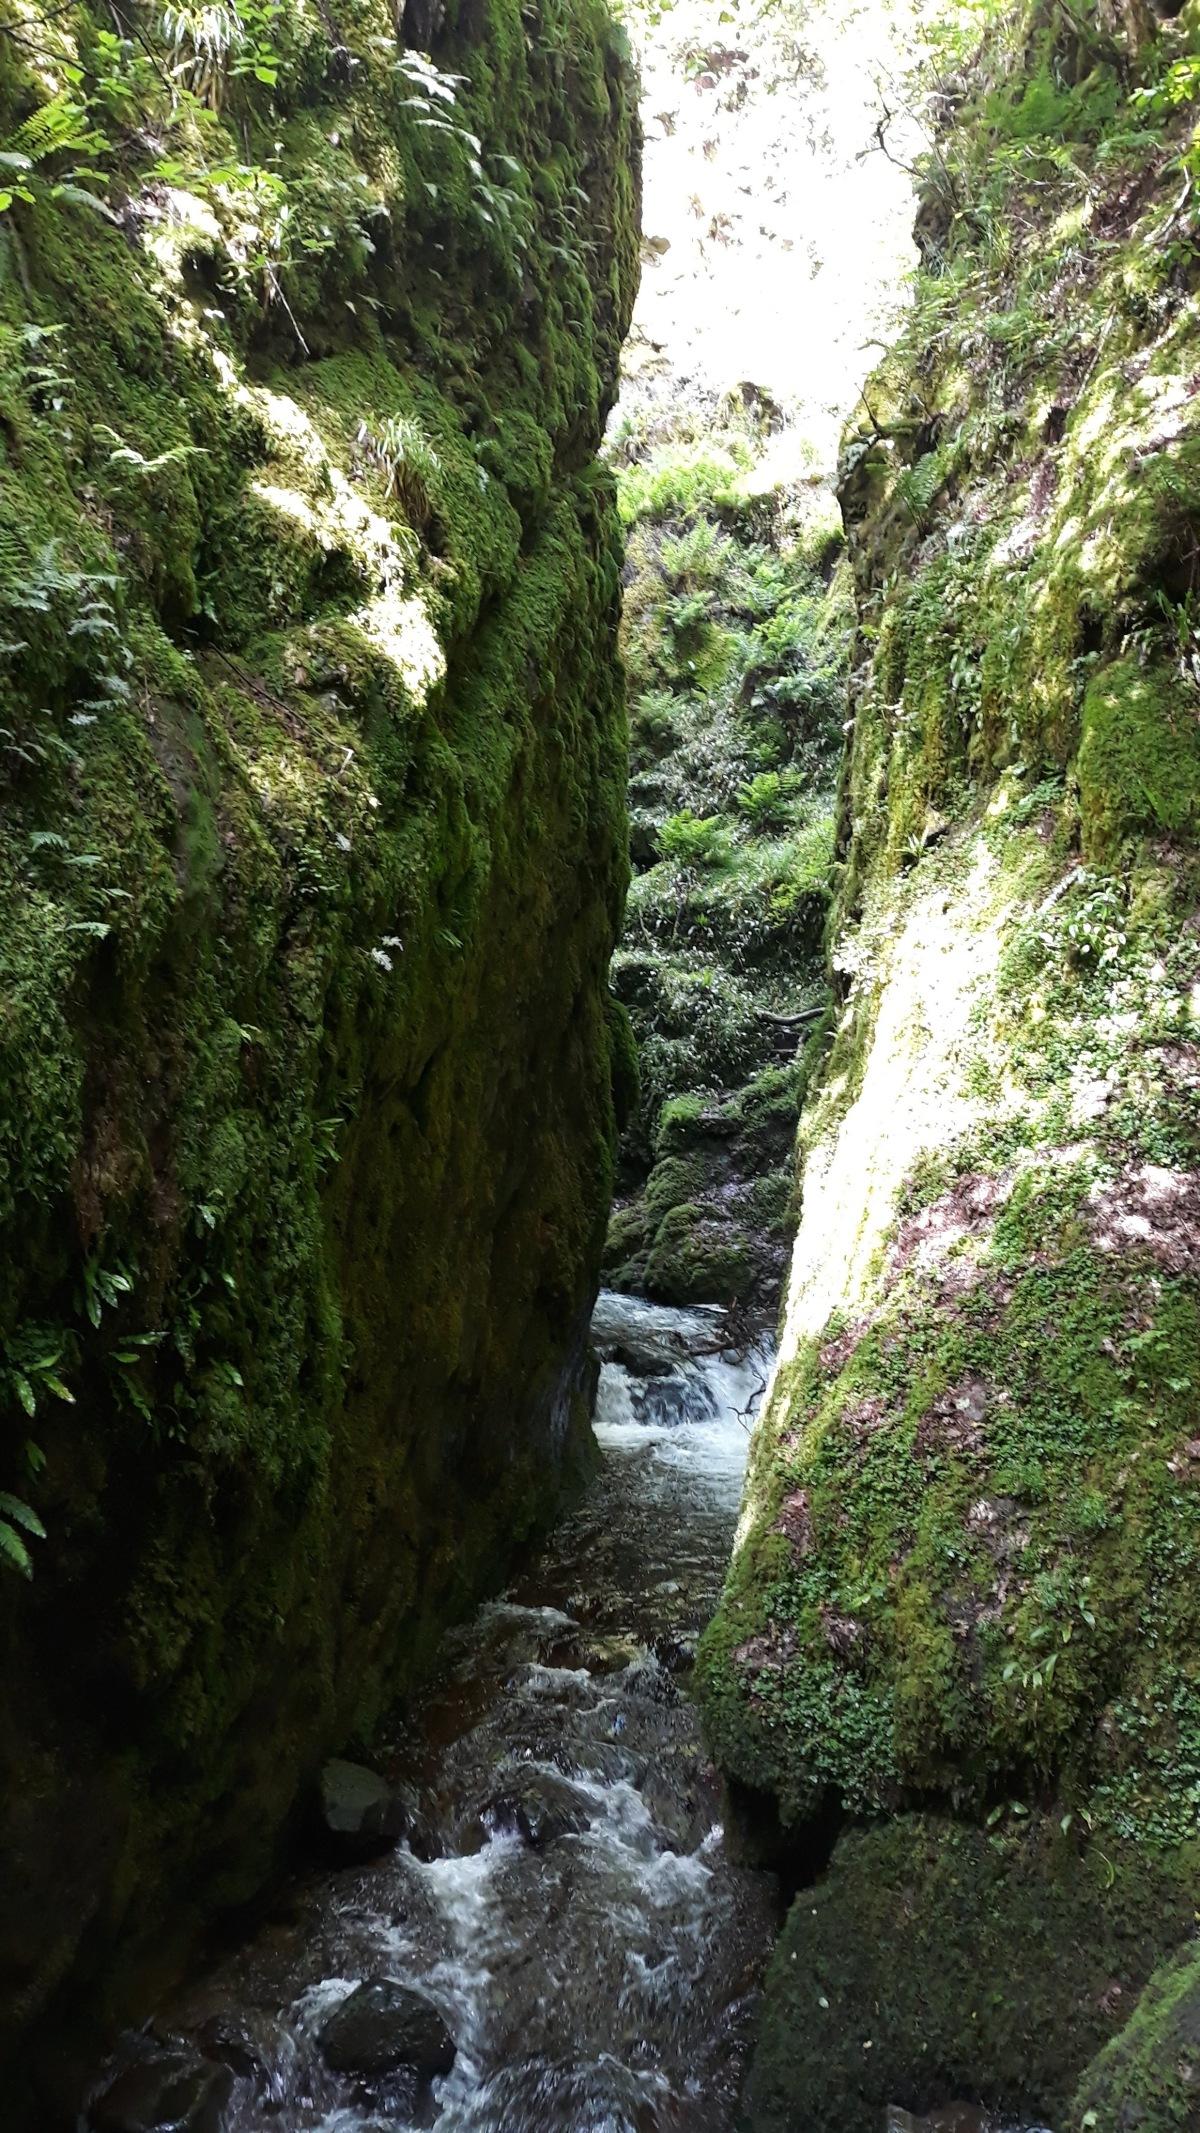 River Sonnet